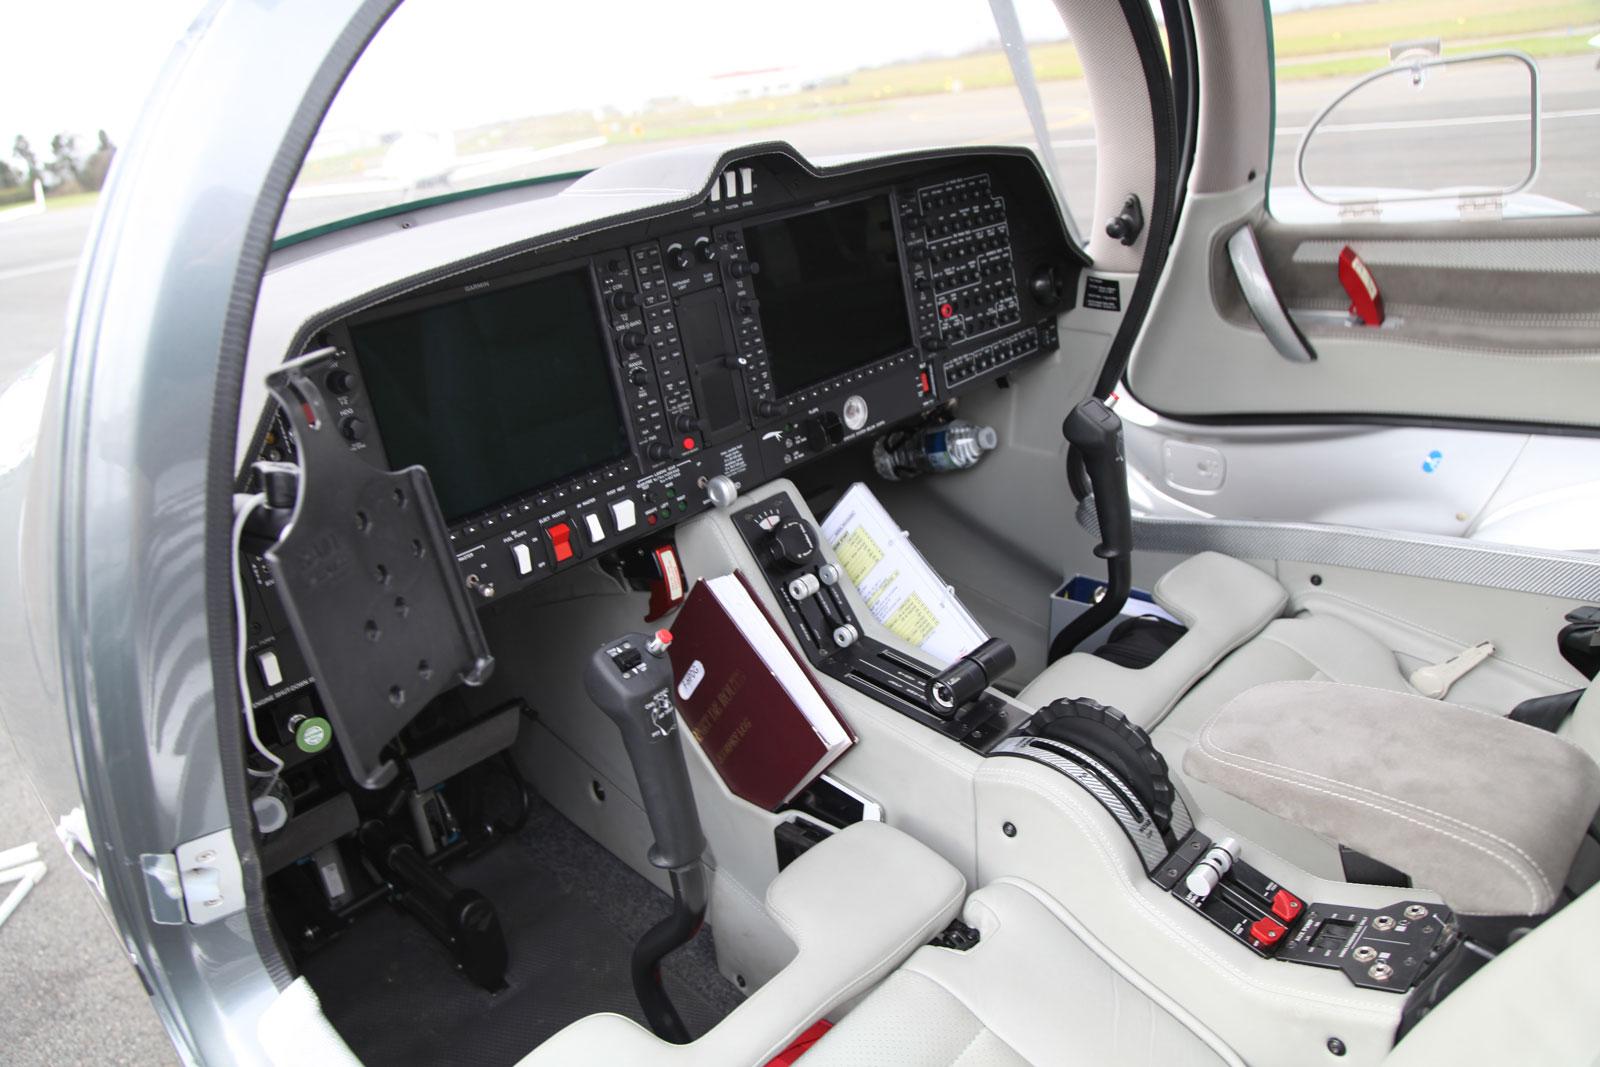 Avion d'occasion 2018 DA62 ATA by Pelletier à Avignon